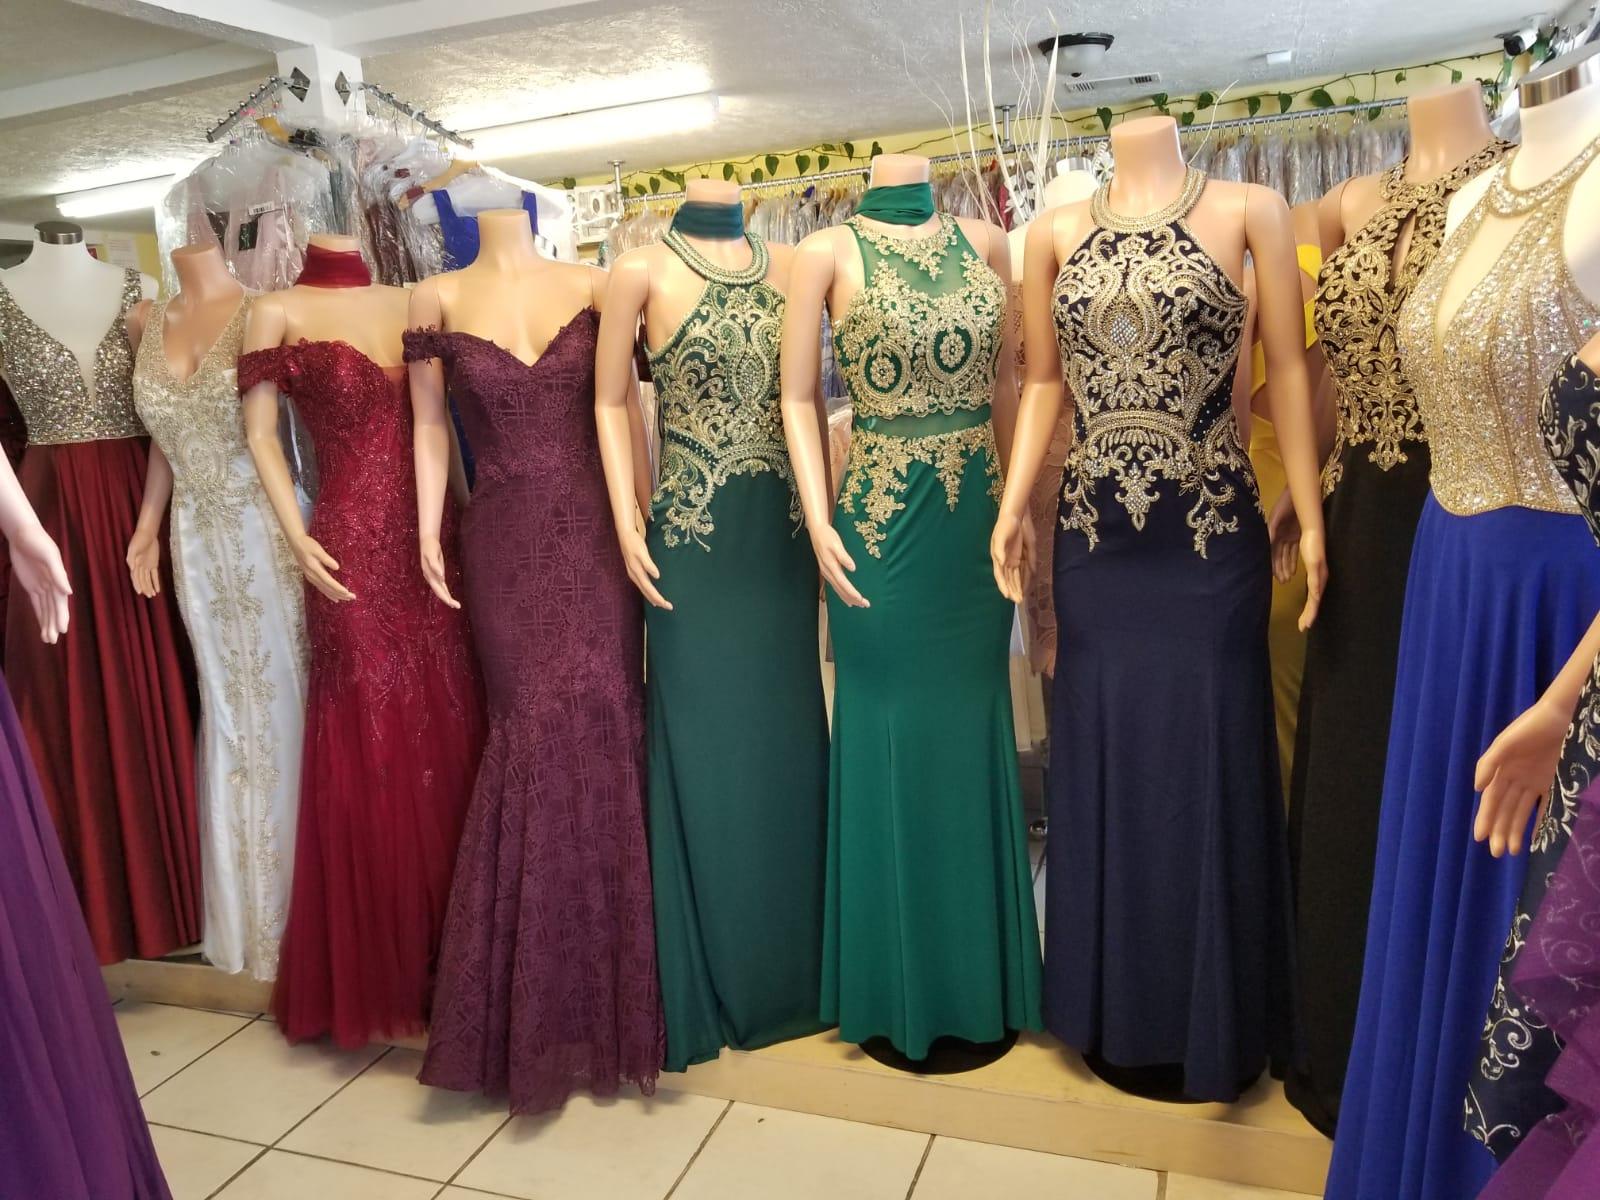 Dresses for party (Sizes XXS - 5XL)